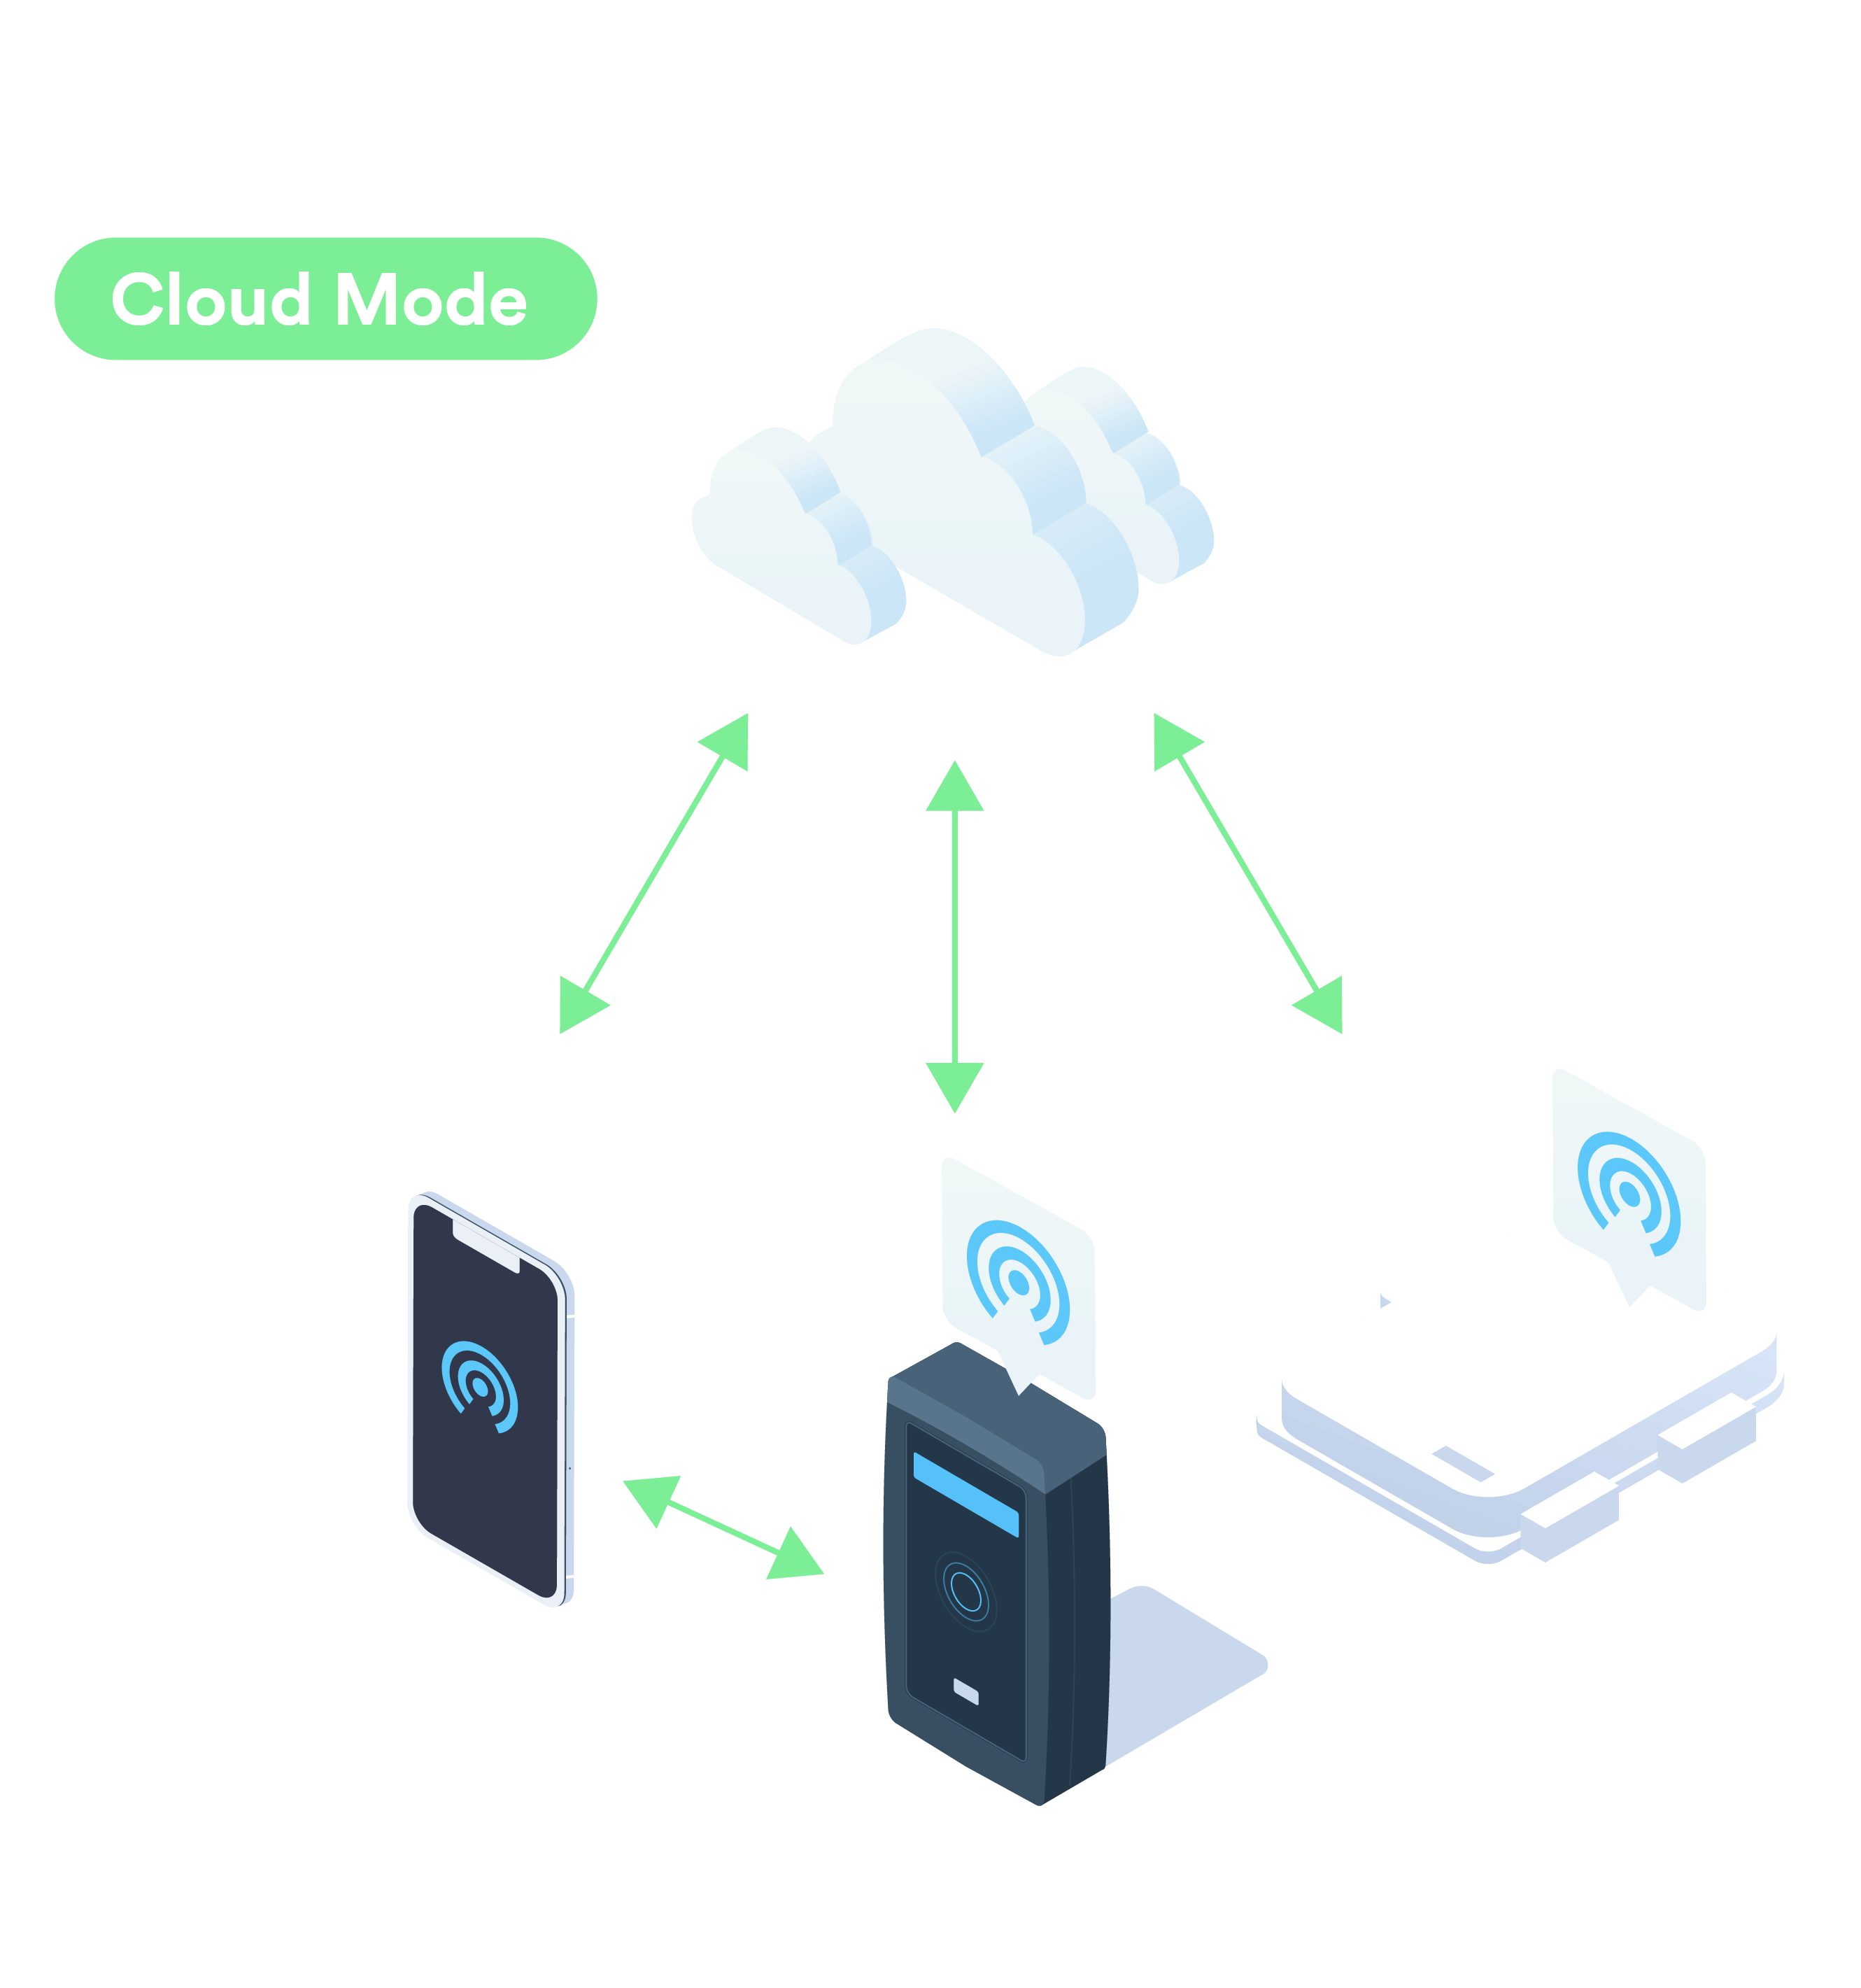 Kisi regular cloud-based mode